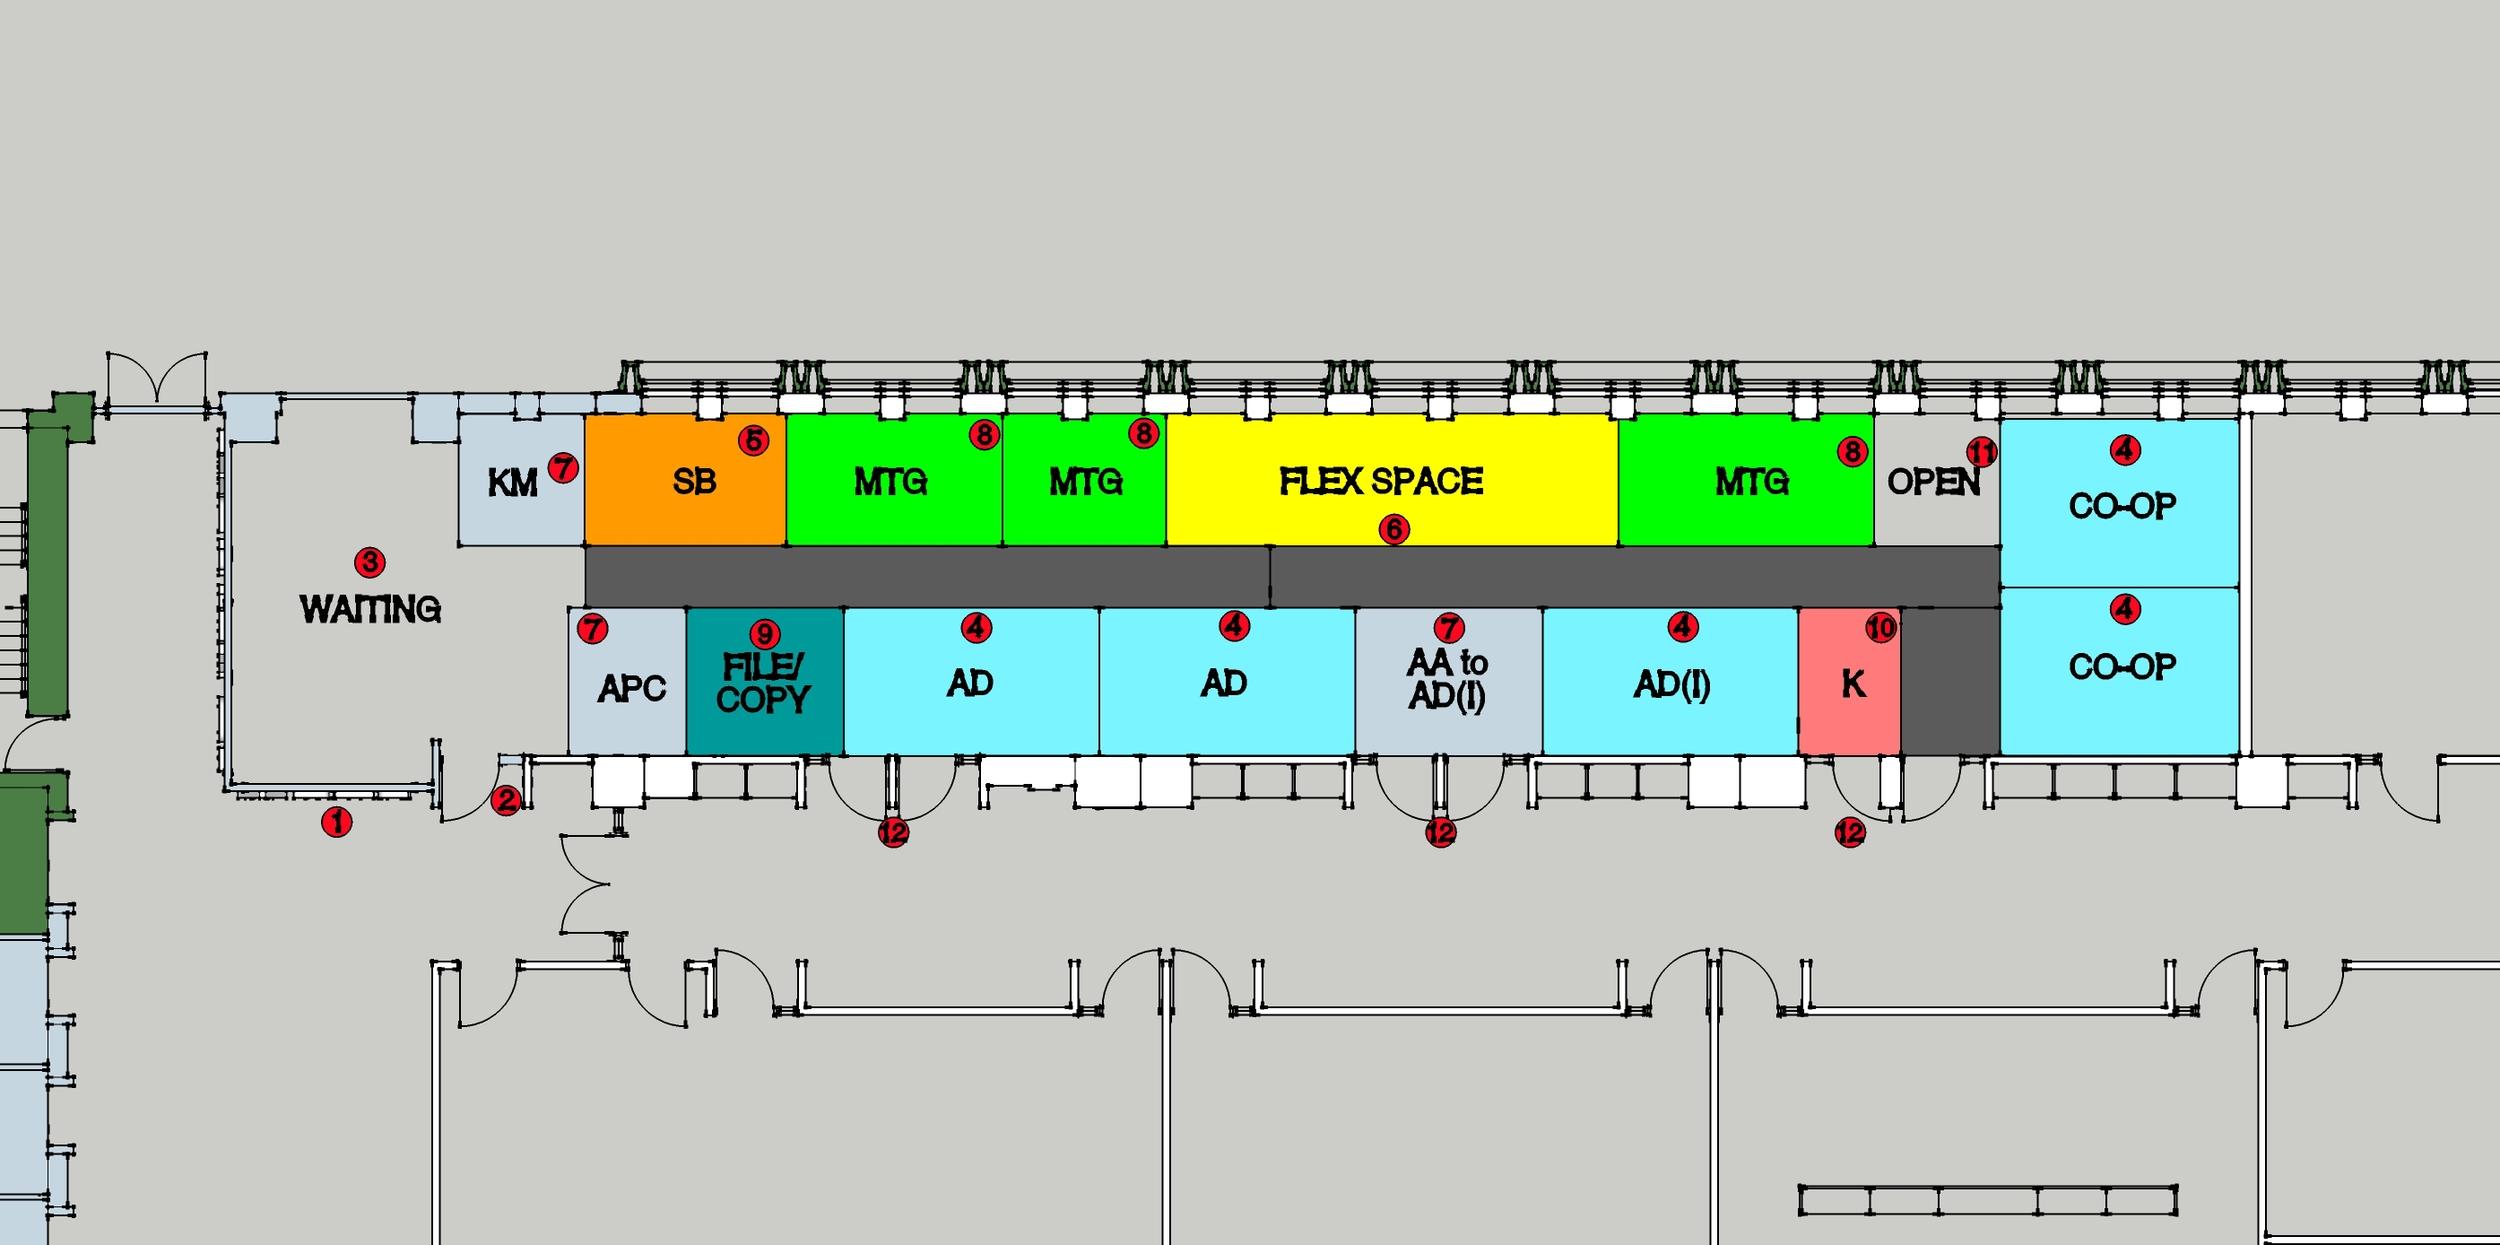 SS-MF-r3-2-plan1.jpg